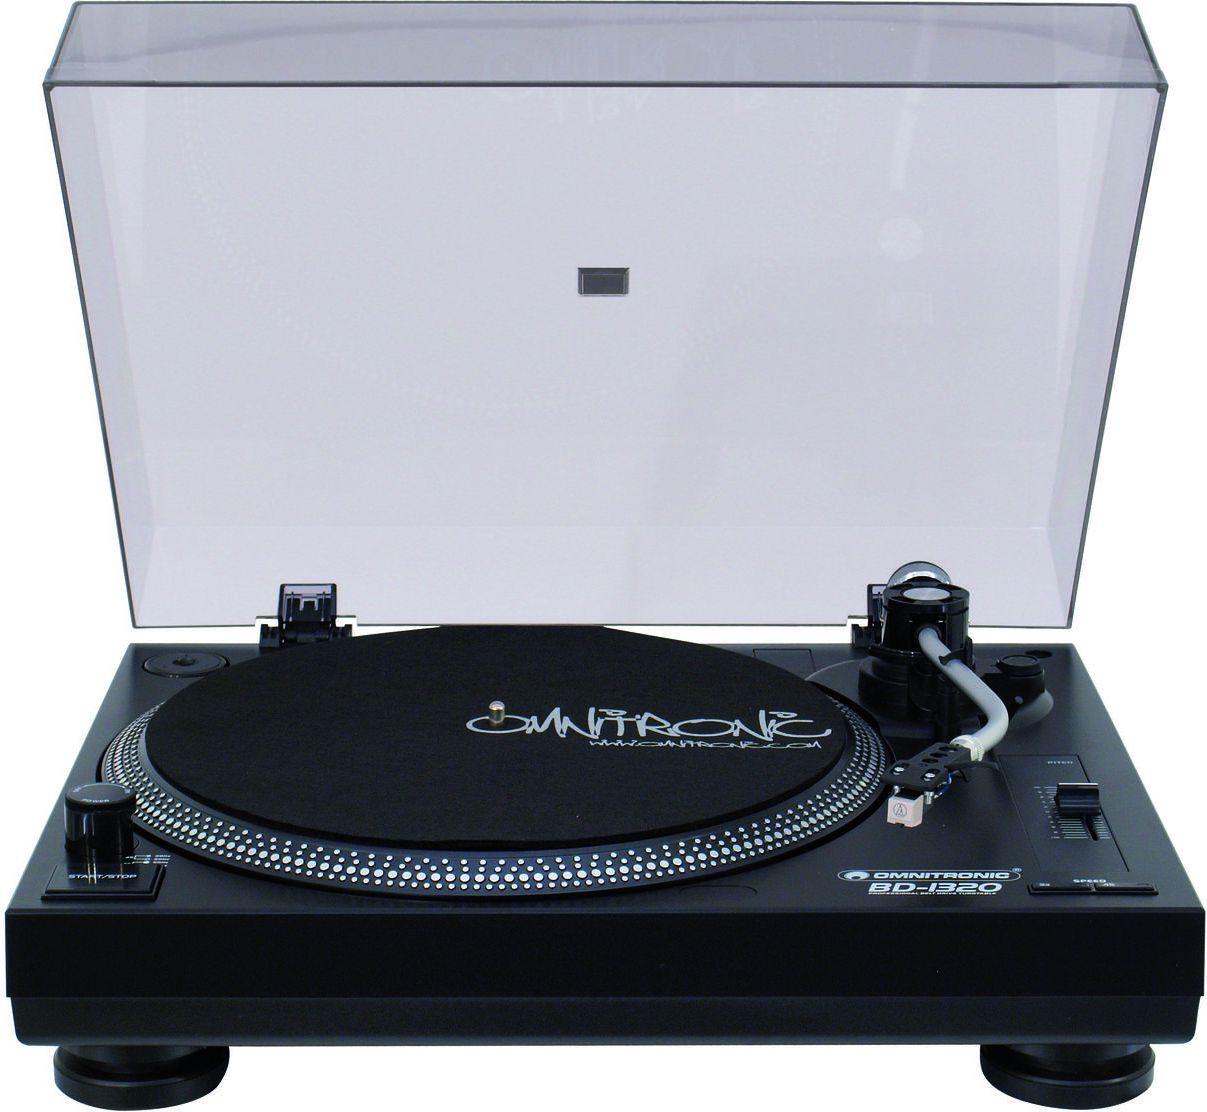 Omnitronic BD-1320 black radio, radiopulksteņi